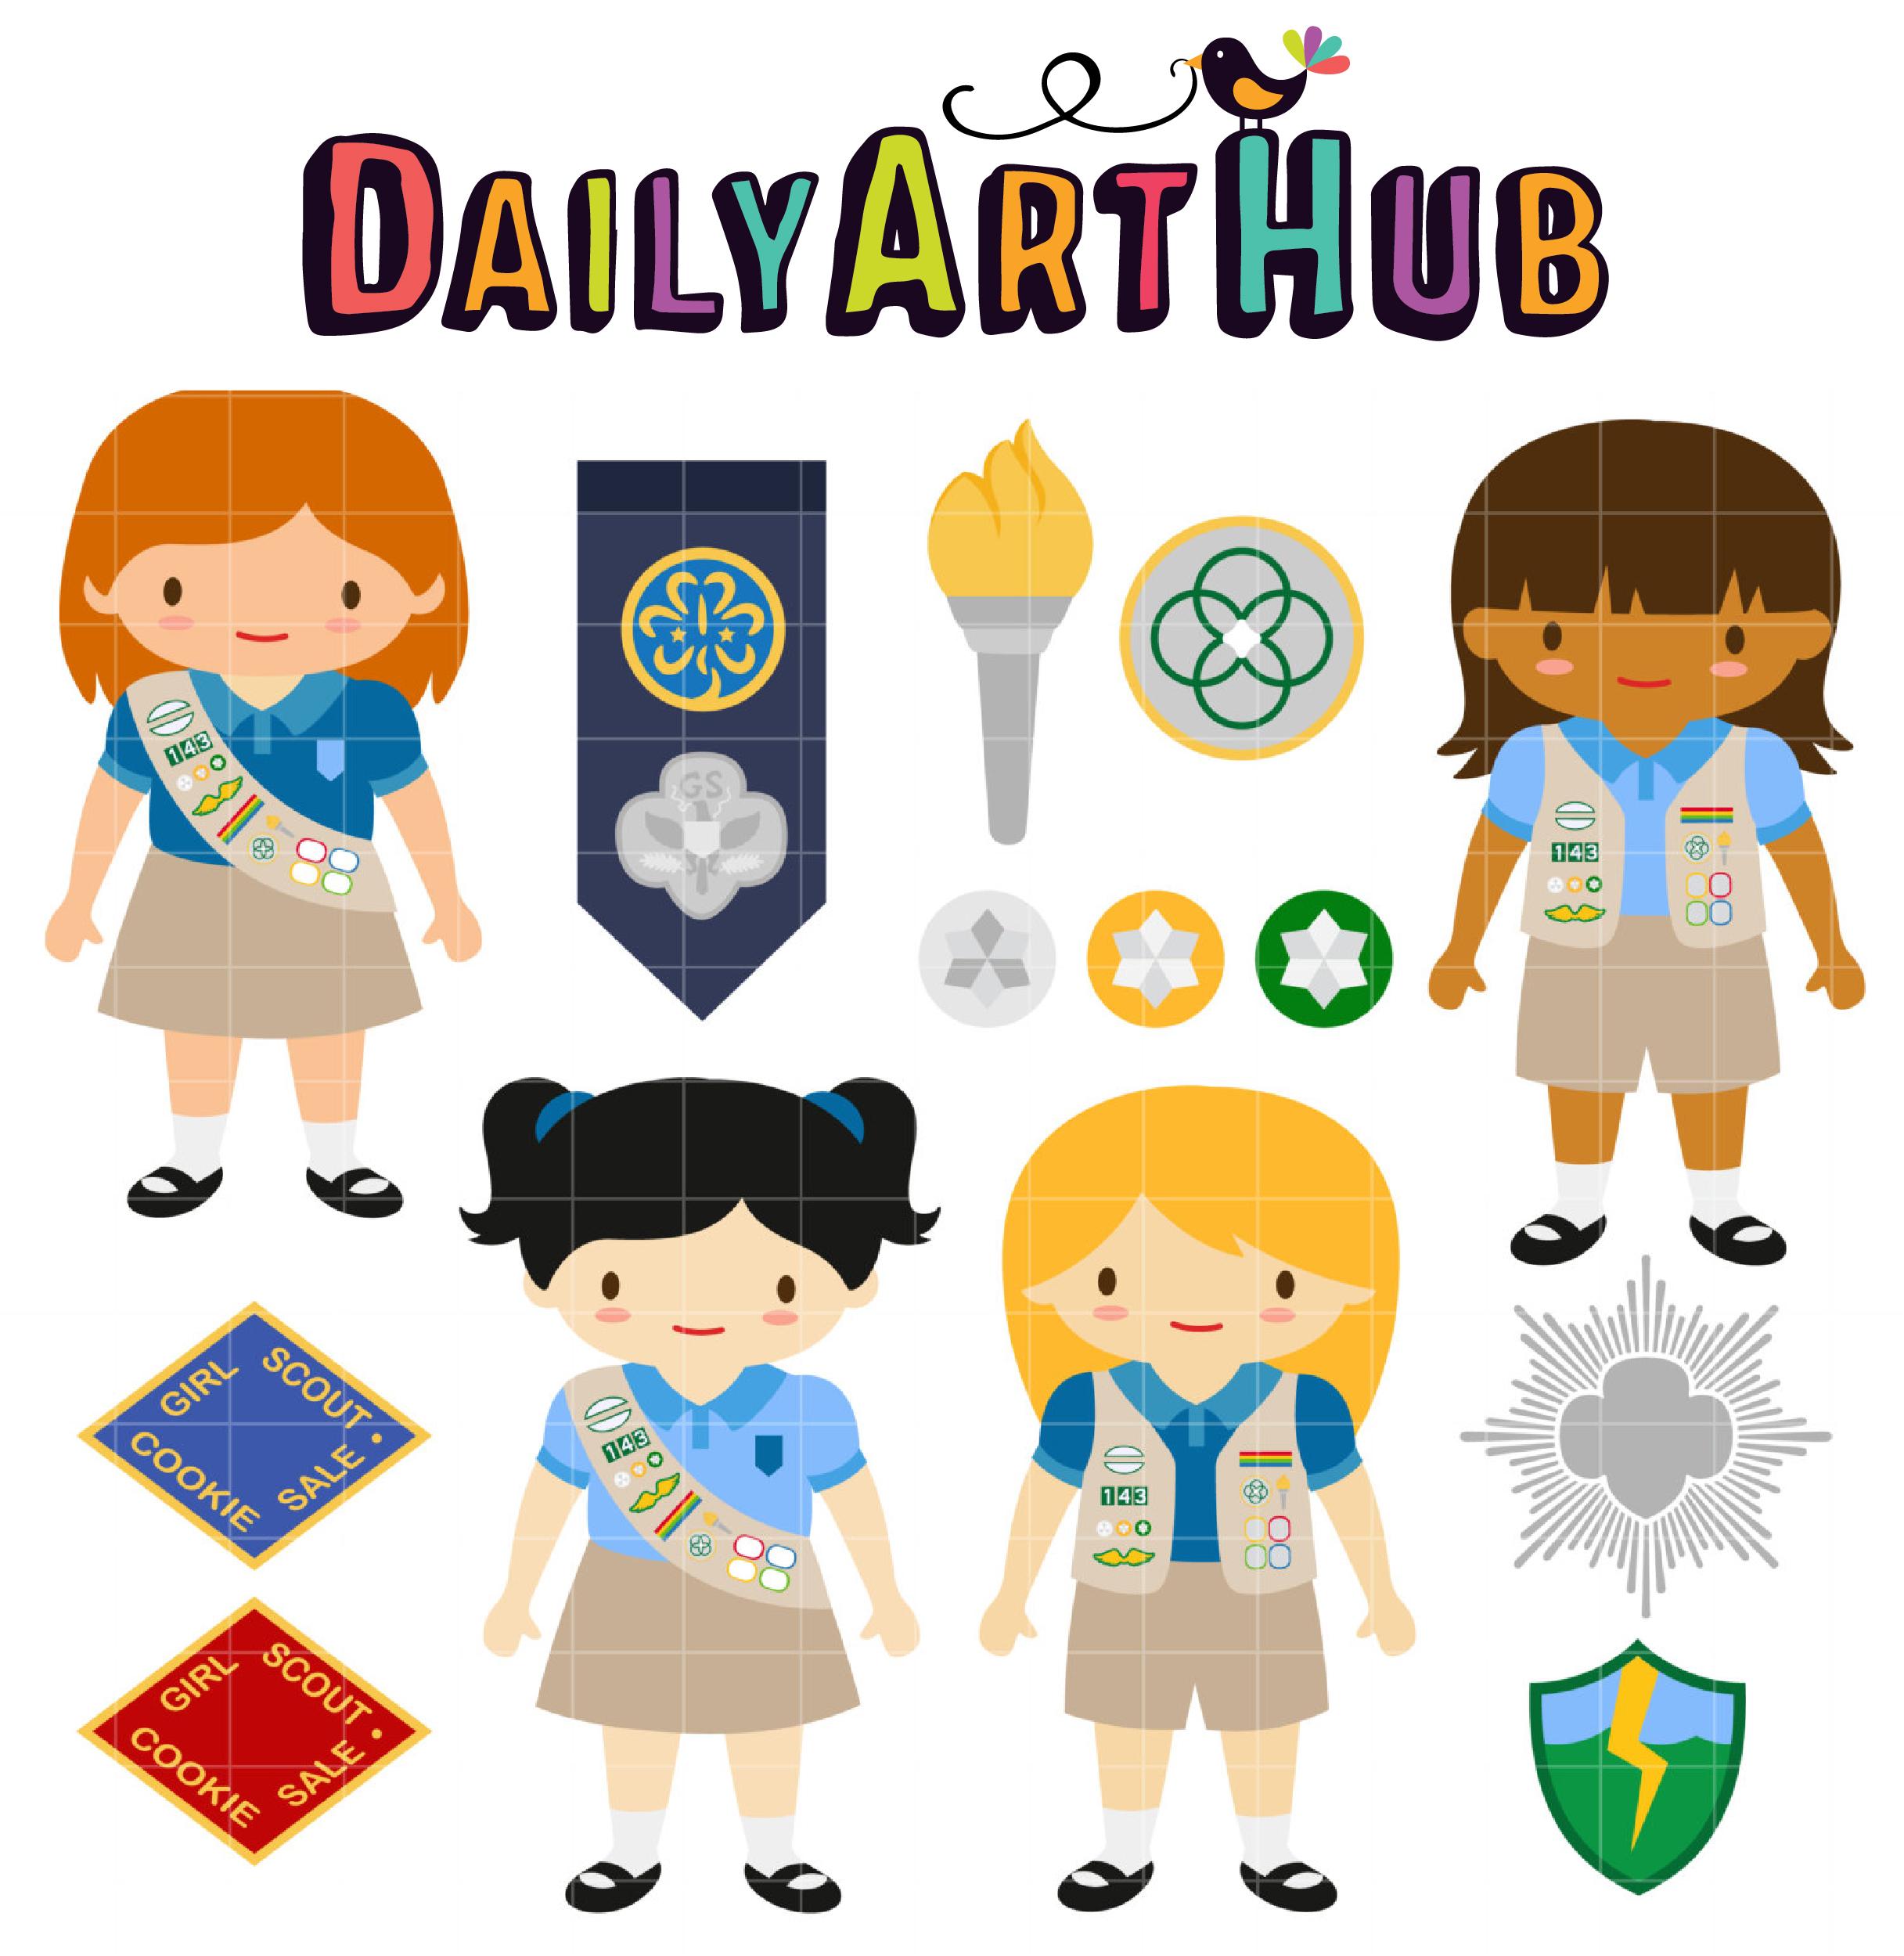 cadette girl scout clip art set daily art hub free clip art everyday rh dailyarthub com girl scout clip art images girl scout trefoil clipart